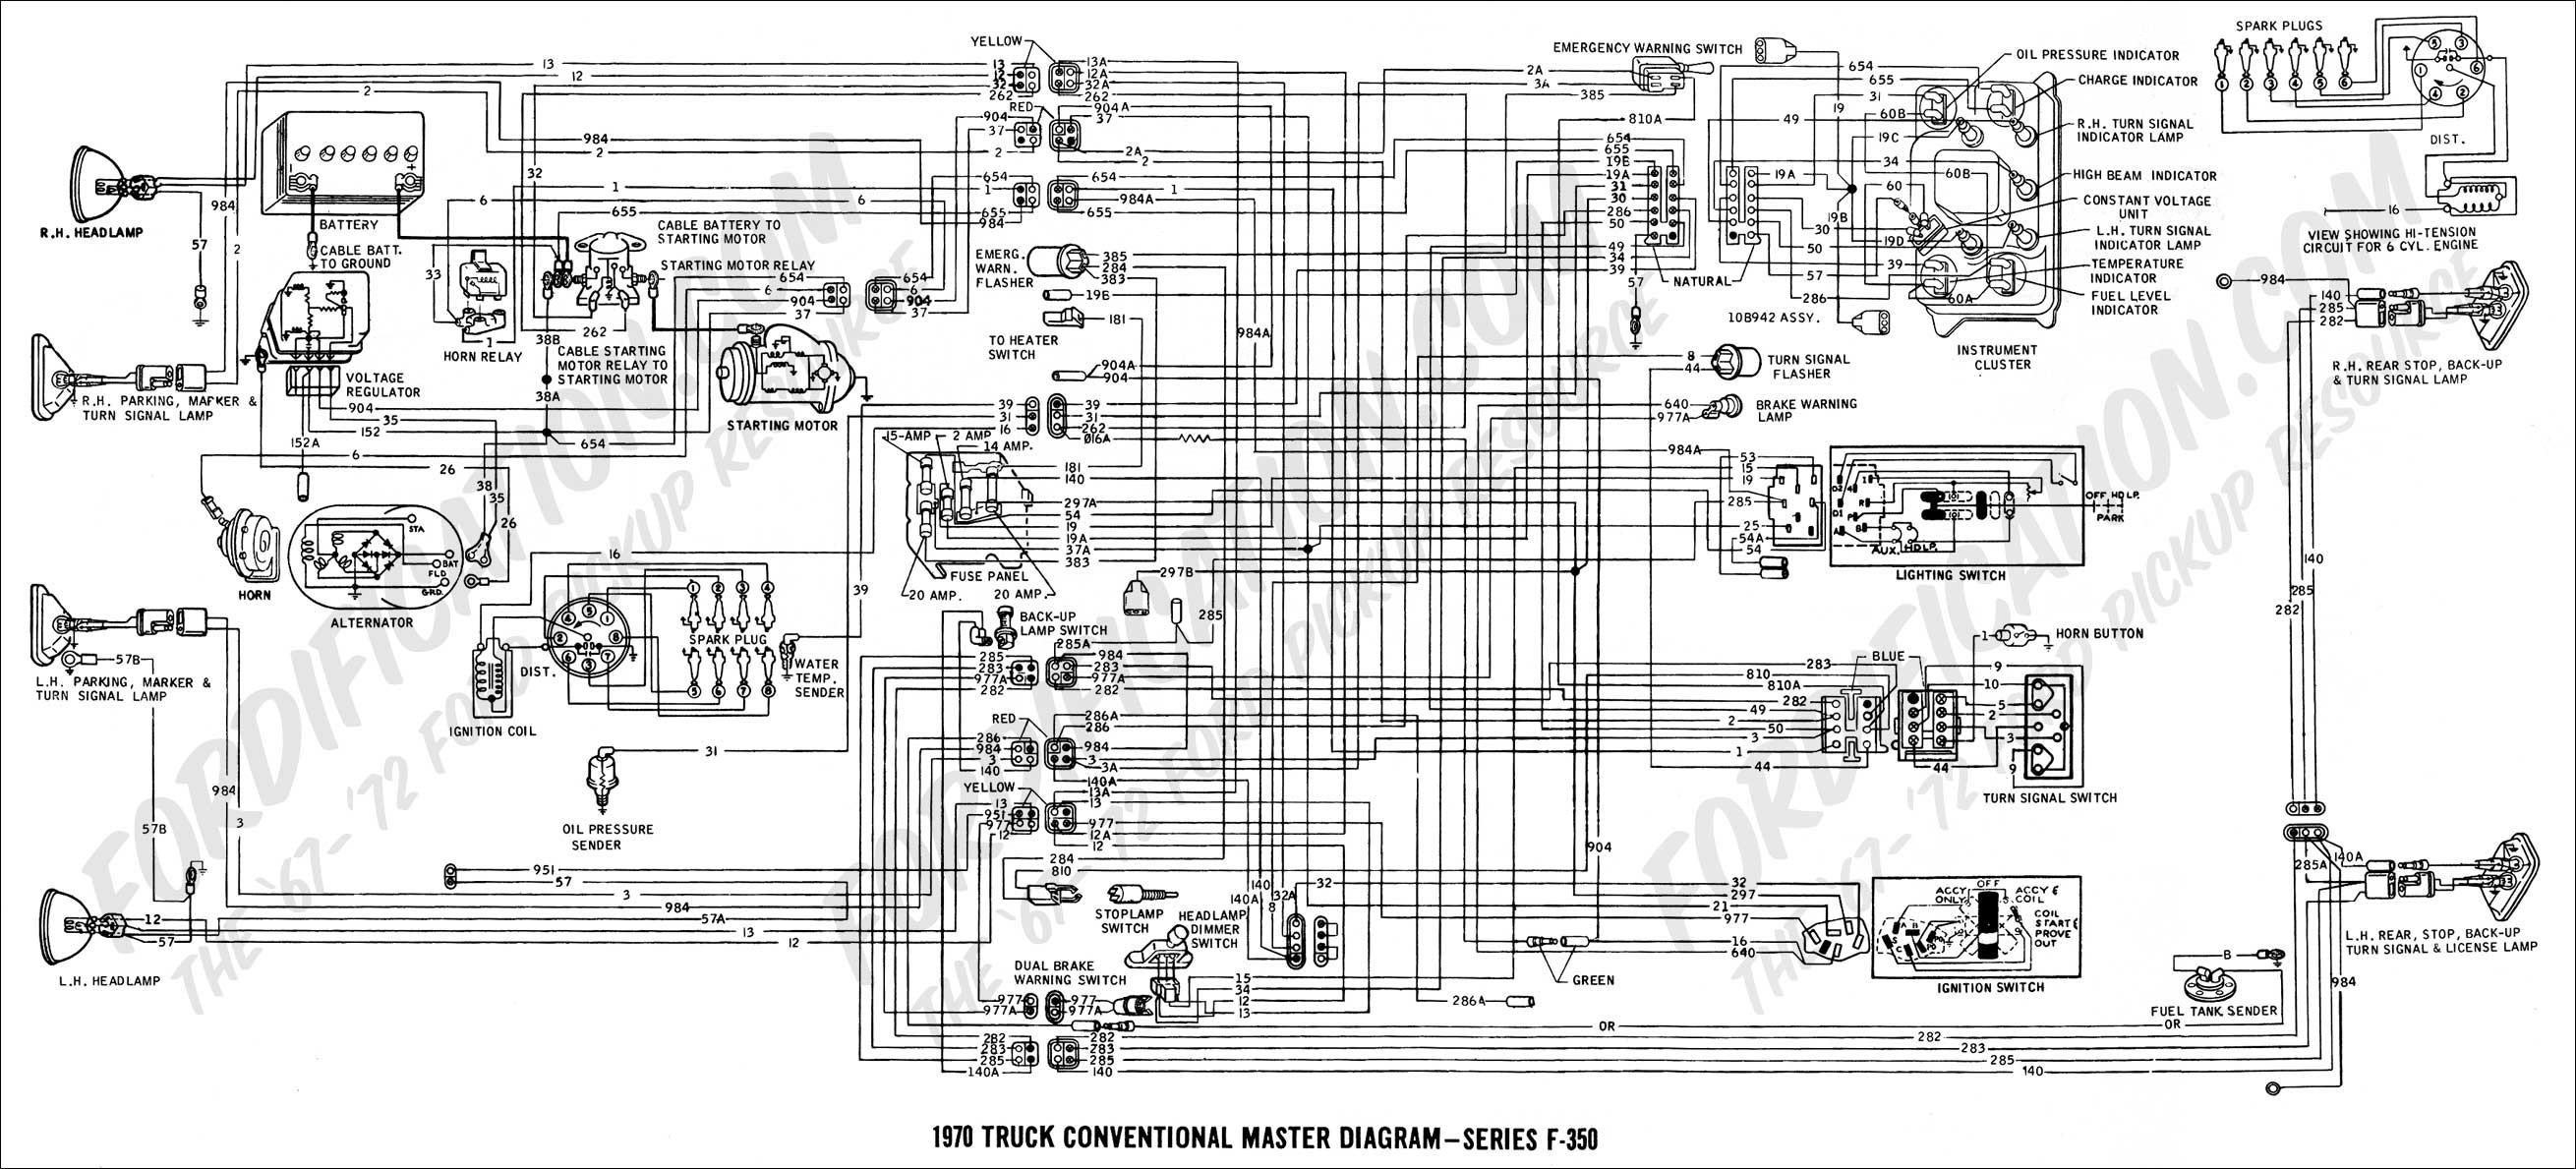 Ford Trailer Plug Wiring Diagram 2006 ford Ranger Wiring Diagram 3 Wiring Diagram Of Ford Trailer Plug Wiring Diagram